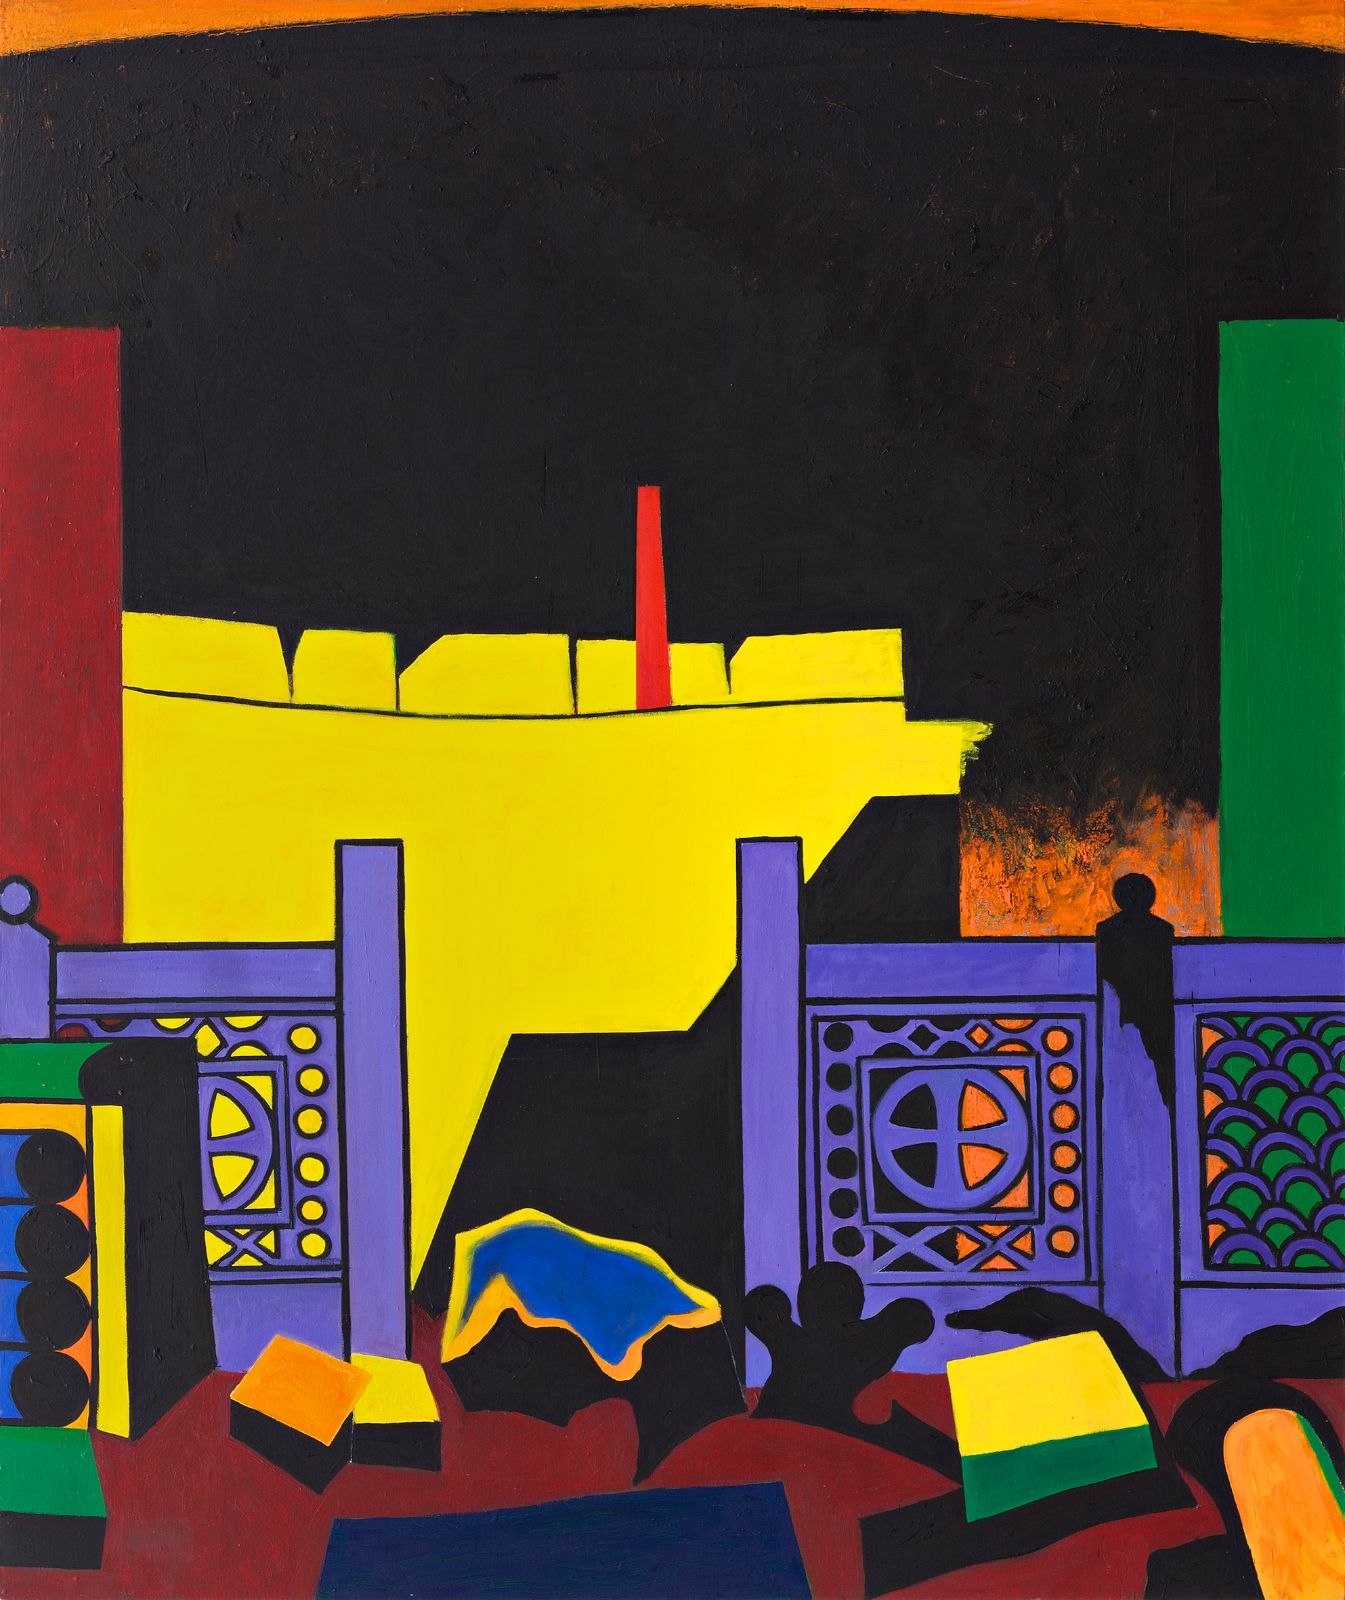 Olympia 2, 2012-2013, oil on canvas, 210 x 175 cm